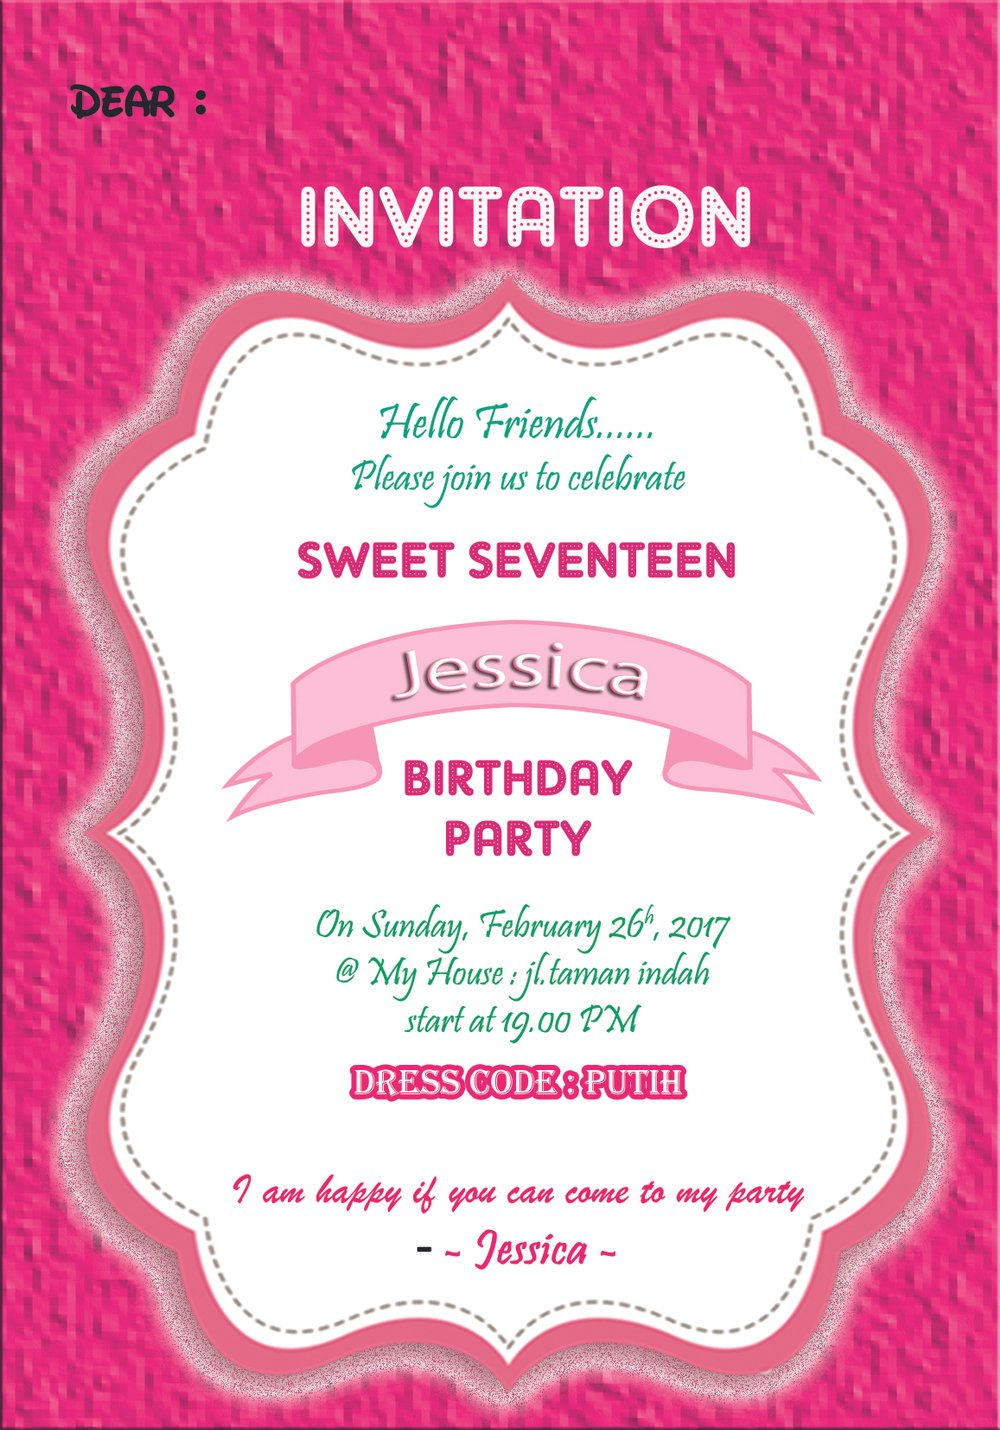 Jual Kartu Undangan Ulang Tahun Invitation Card Sweet Seventeen